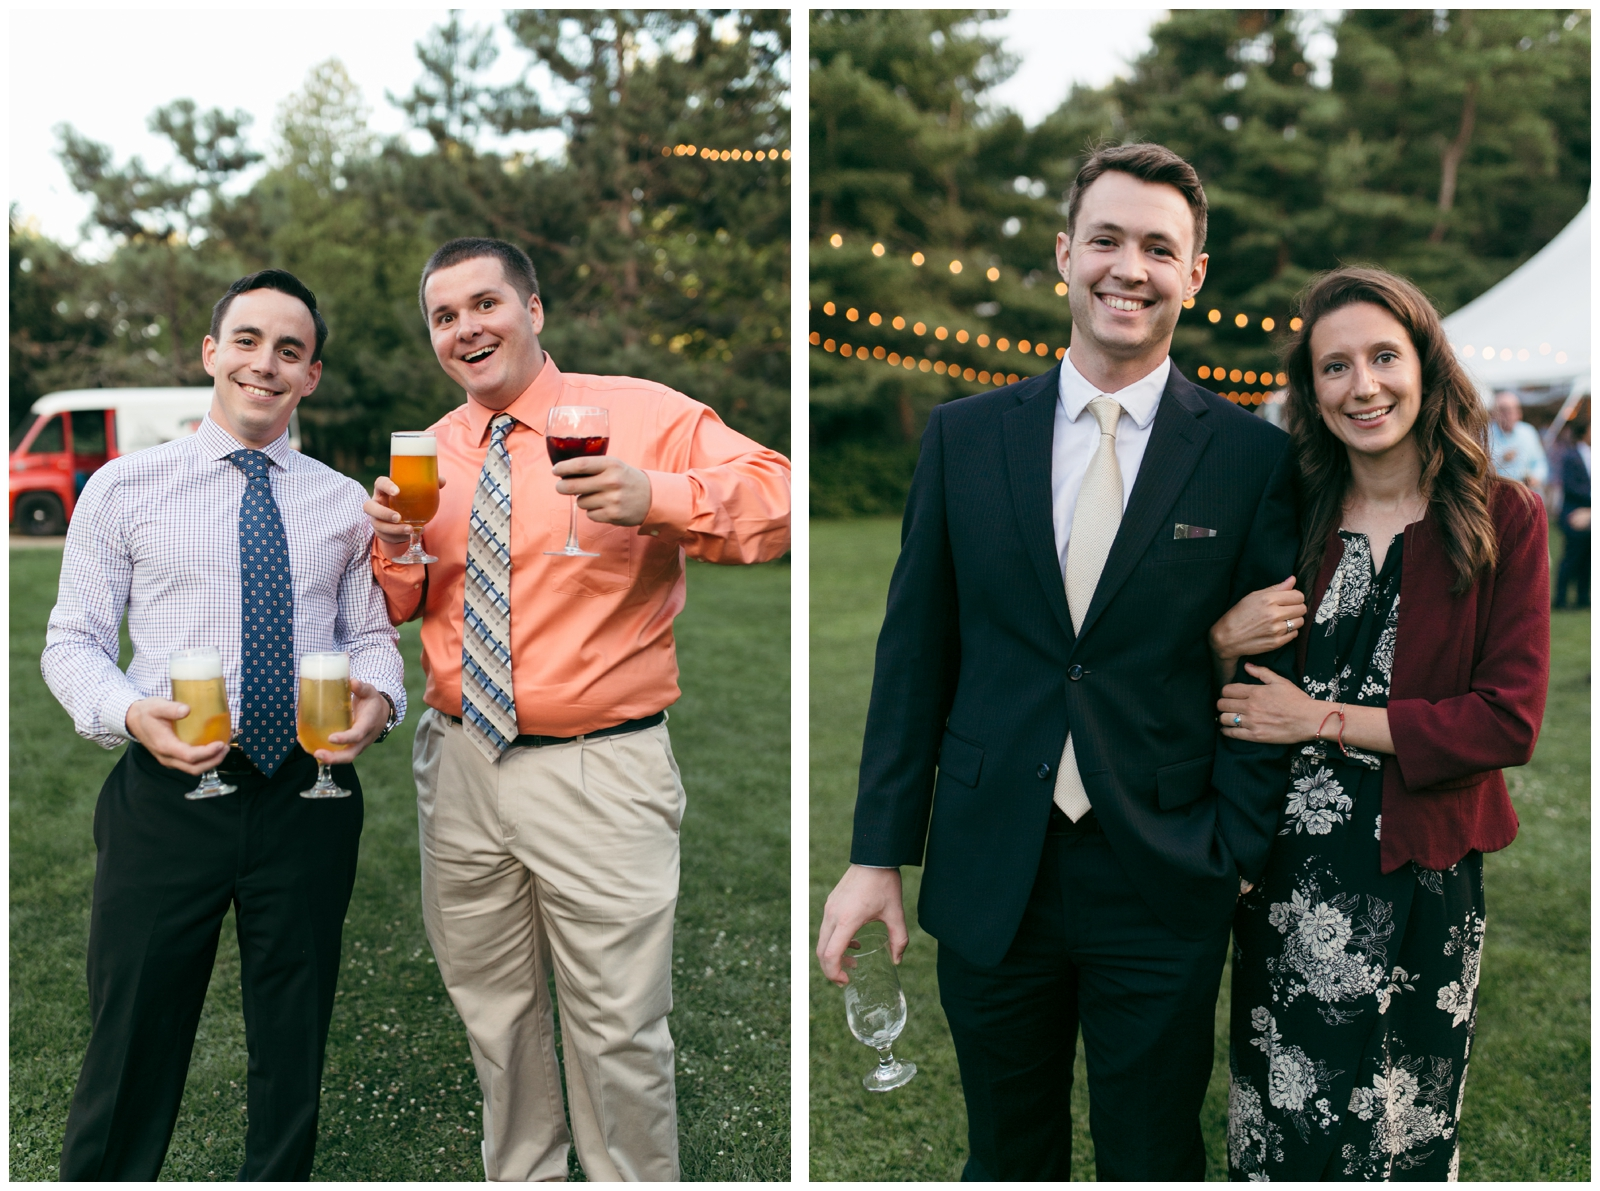 Moraine-Farm-wedding-Bailey-Q-Photo-Massachusetts-wedding-photpgrapher-129.jpg